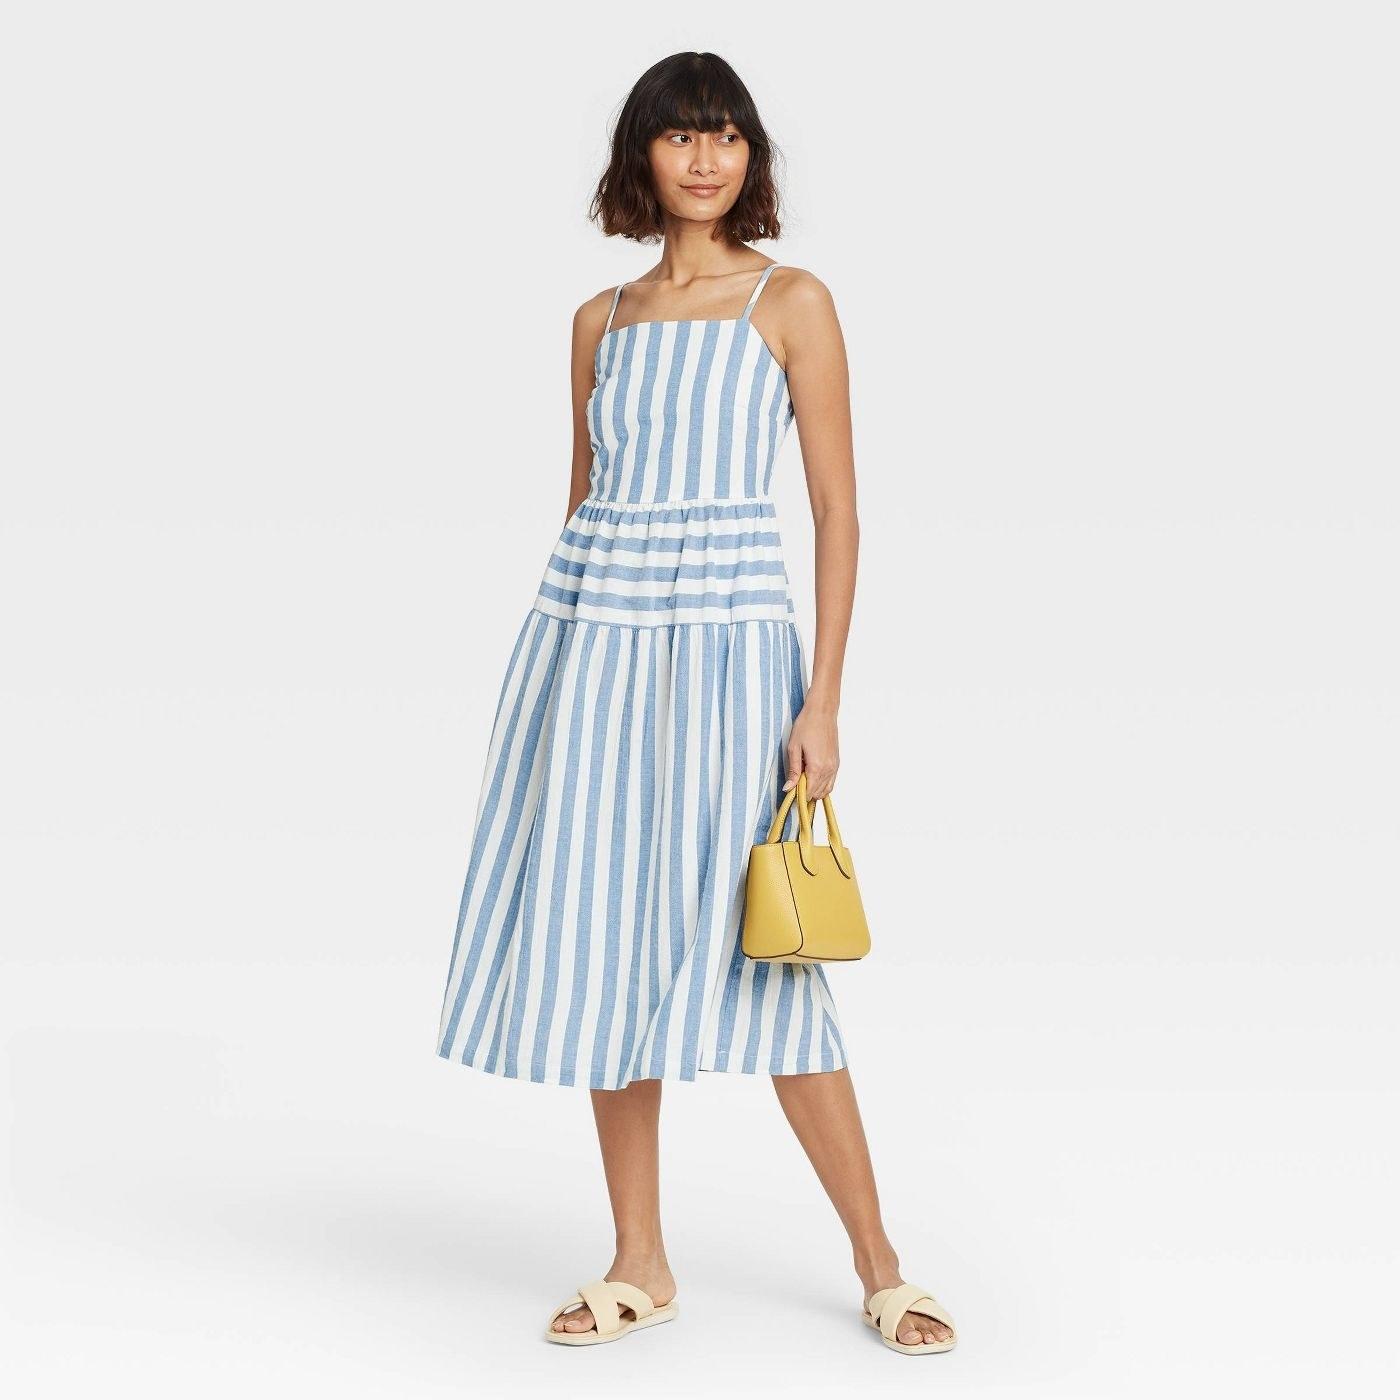 Model in striped tiered dress